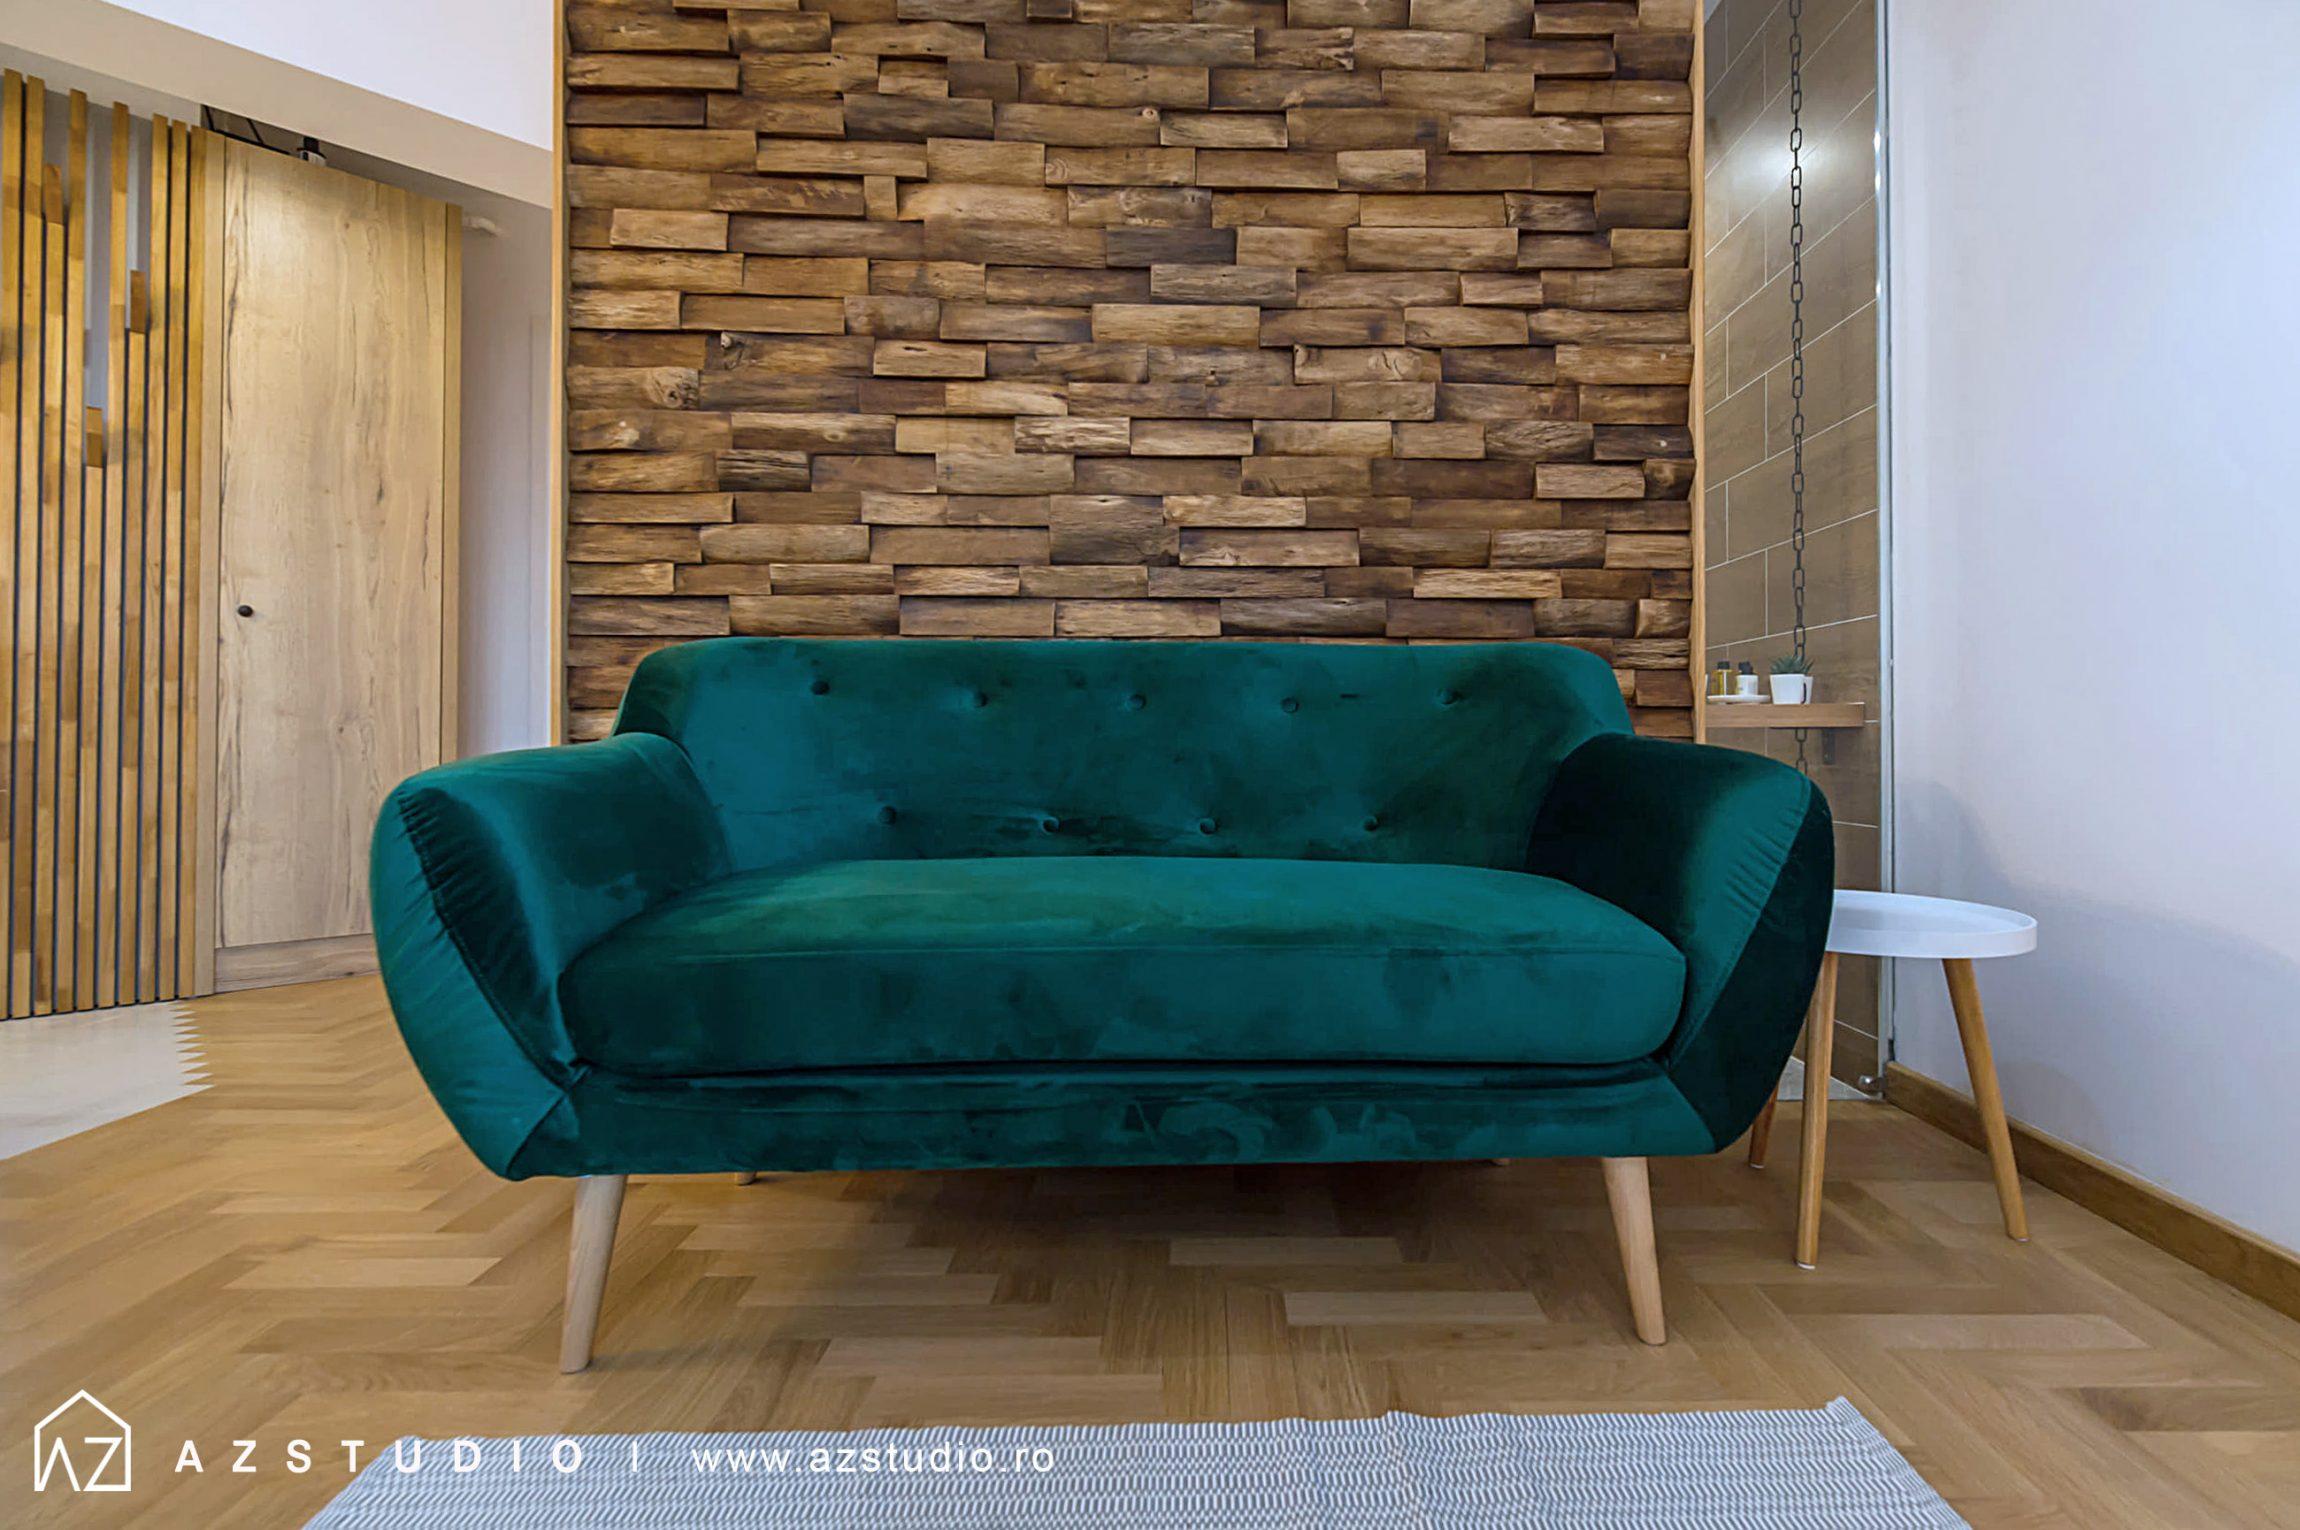 Amenajare studio de vacanta regim hotelier 23mp in Brasov, Romania